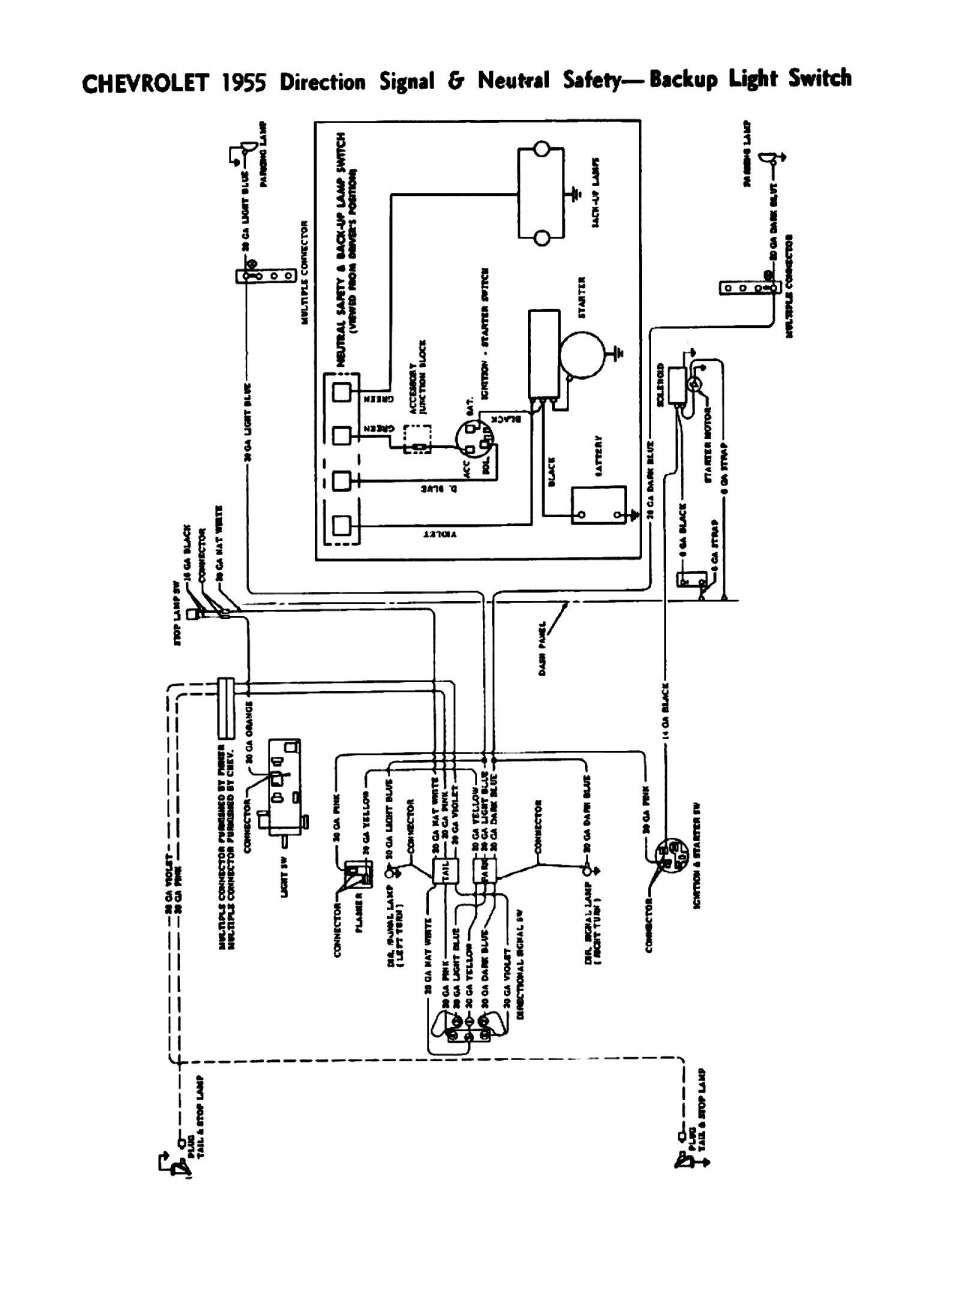 18 Chevrolet Truck Key Switch Wiring Diagram Electrical Wiring Diagram Chevy Trucks Trailer Wiring Diagram